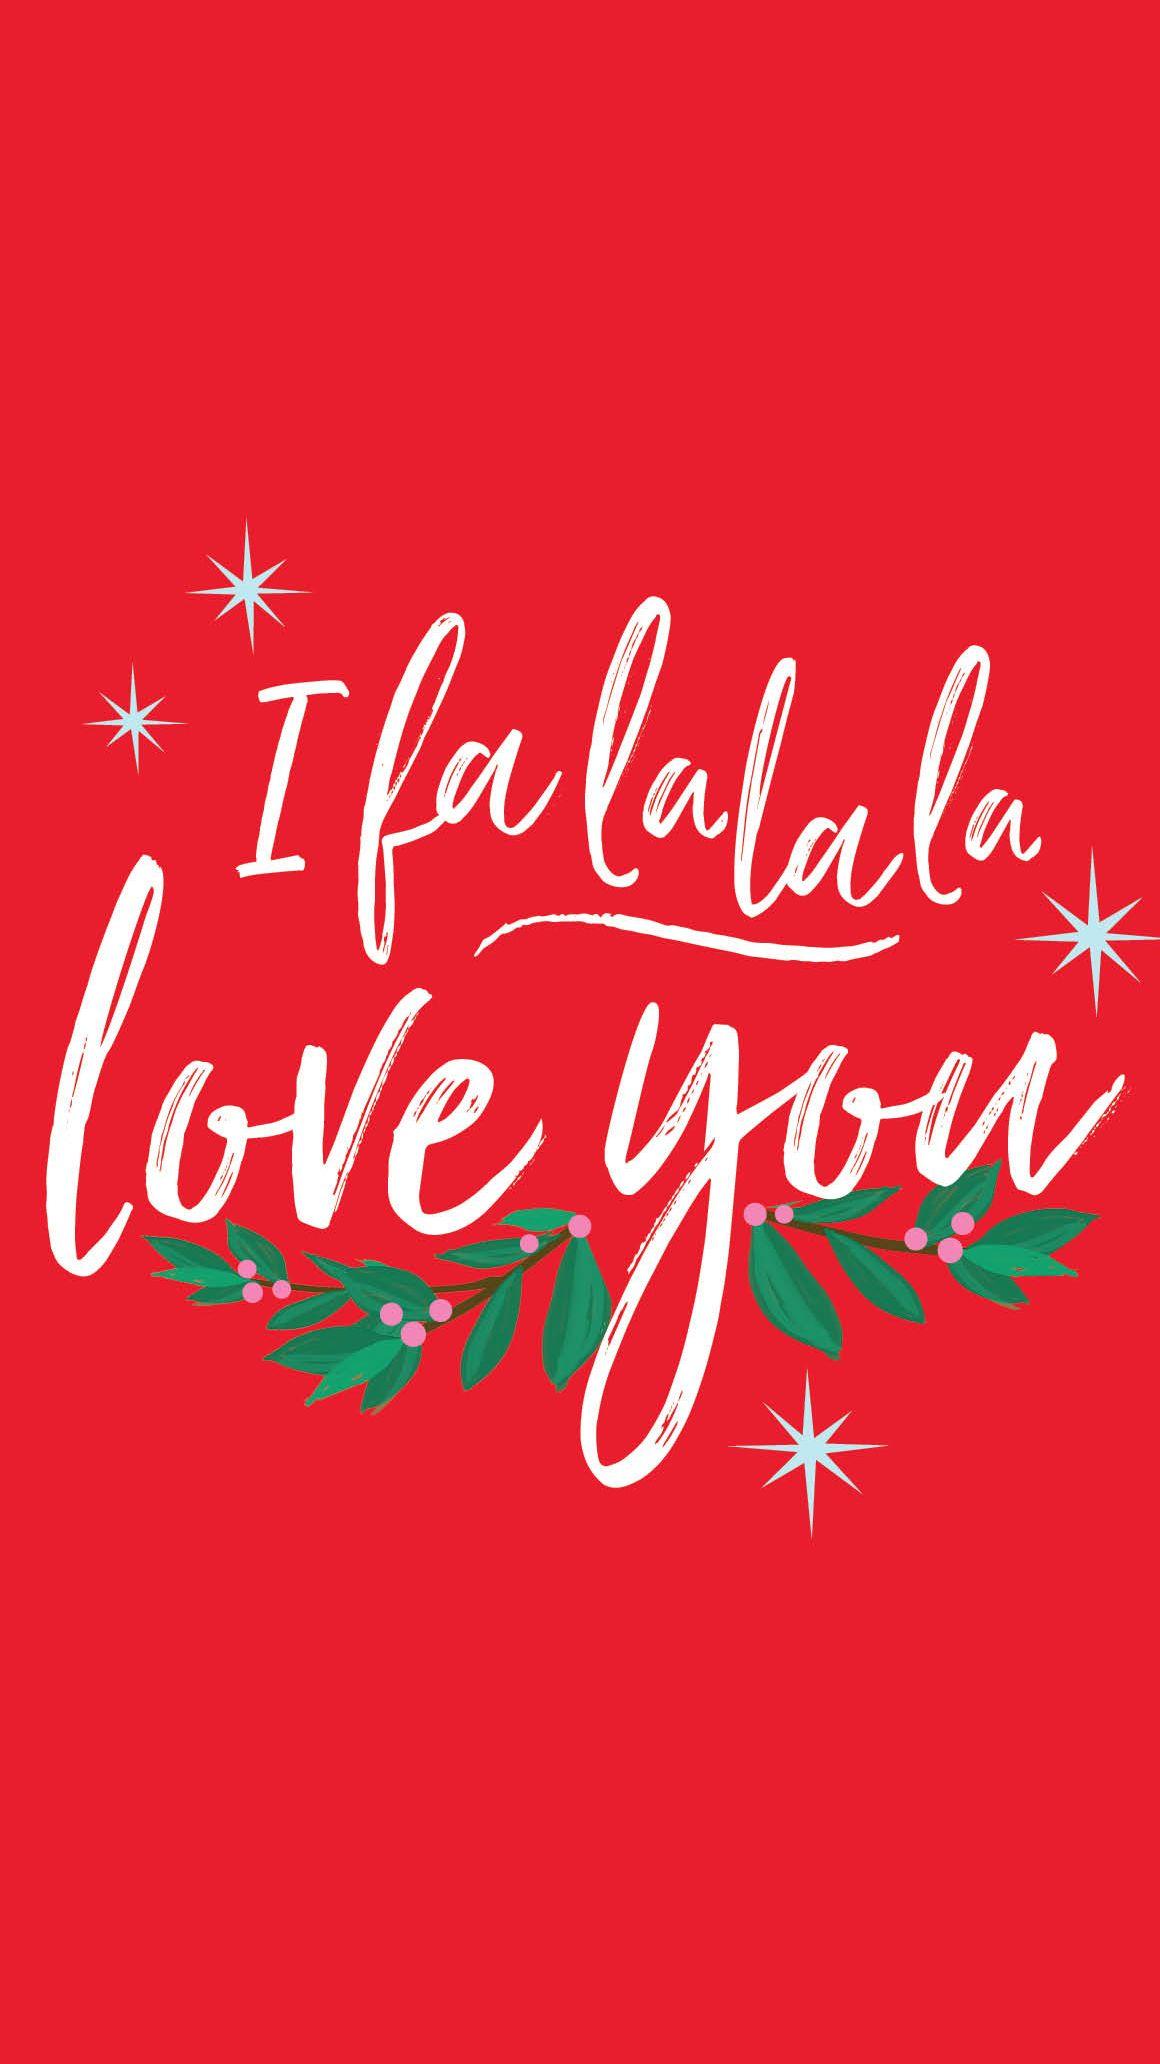 I Love You Christmas Iphone Wallpaper Wallpaper Iphone Christmas Cute Christmas Wallpaper Iphone Wallpaper